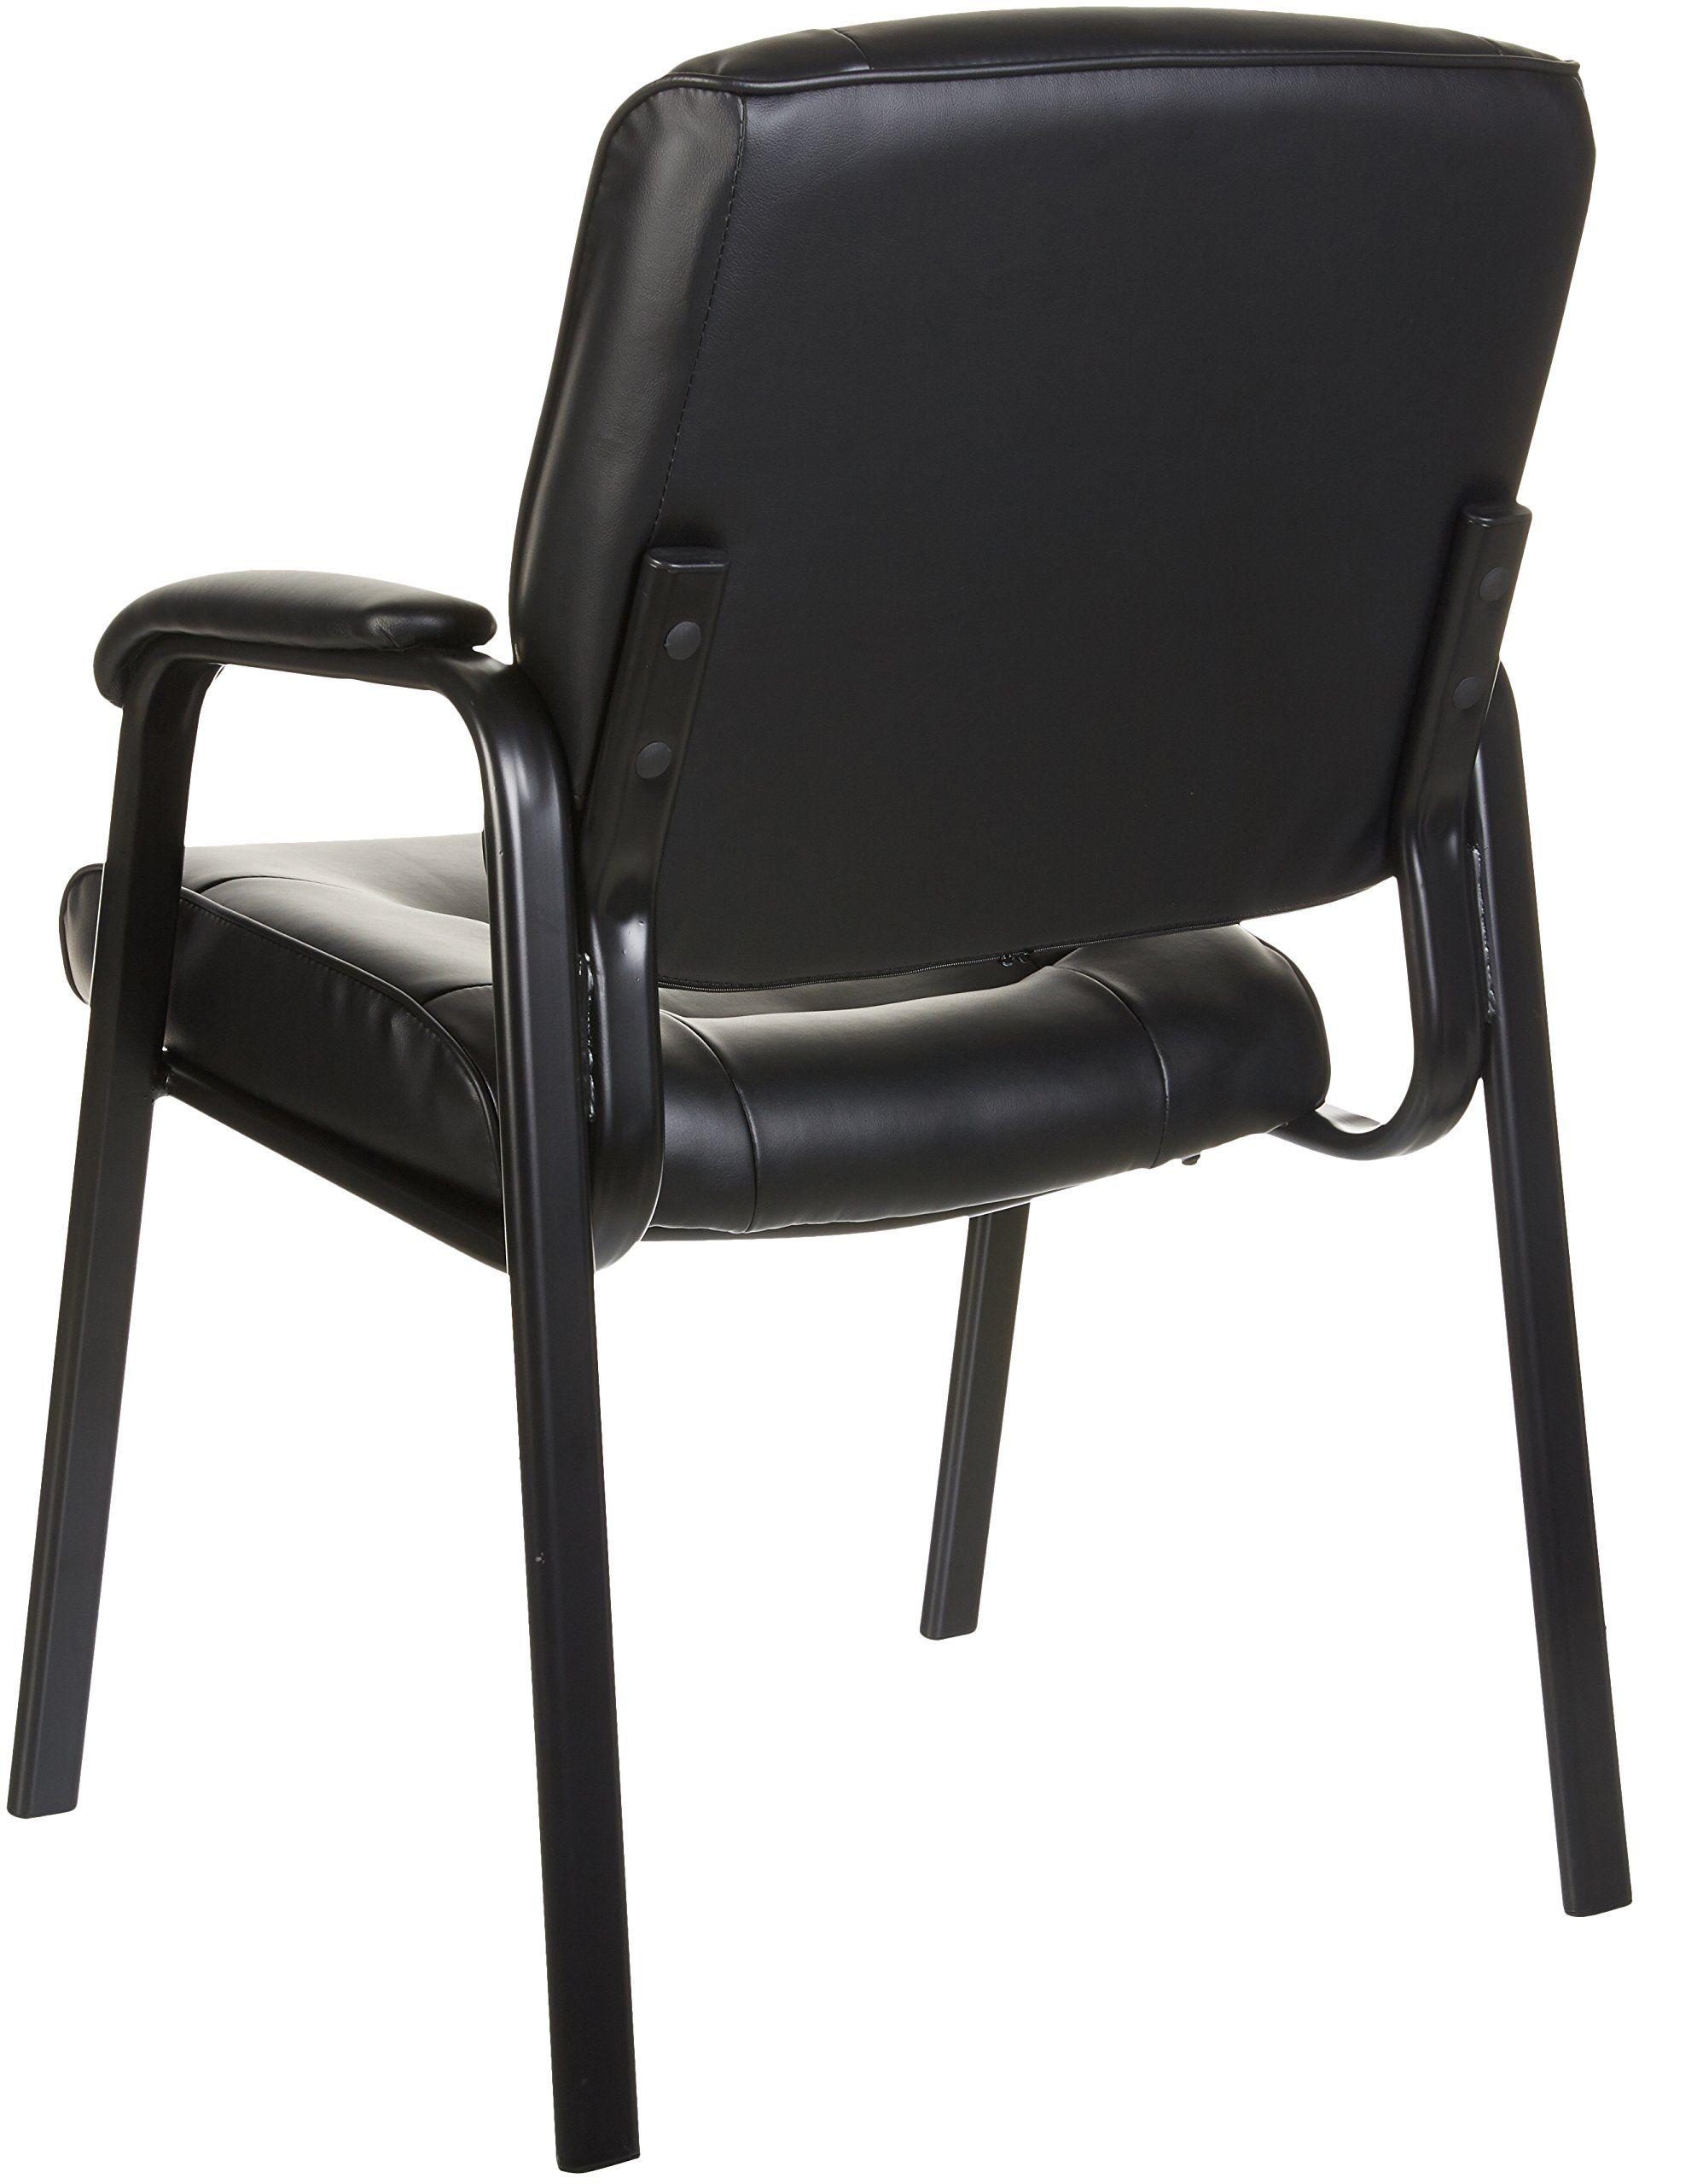 ergonomic office chair amazon uk